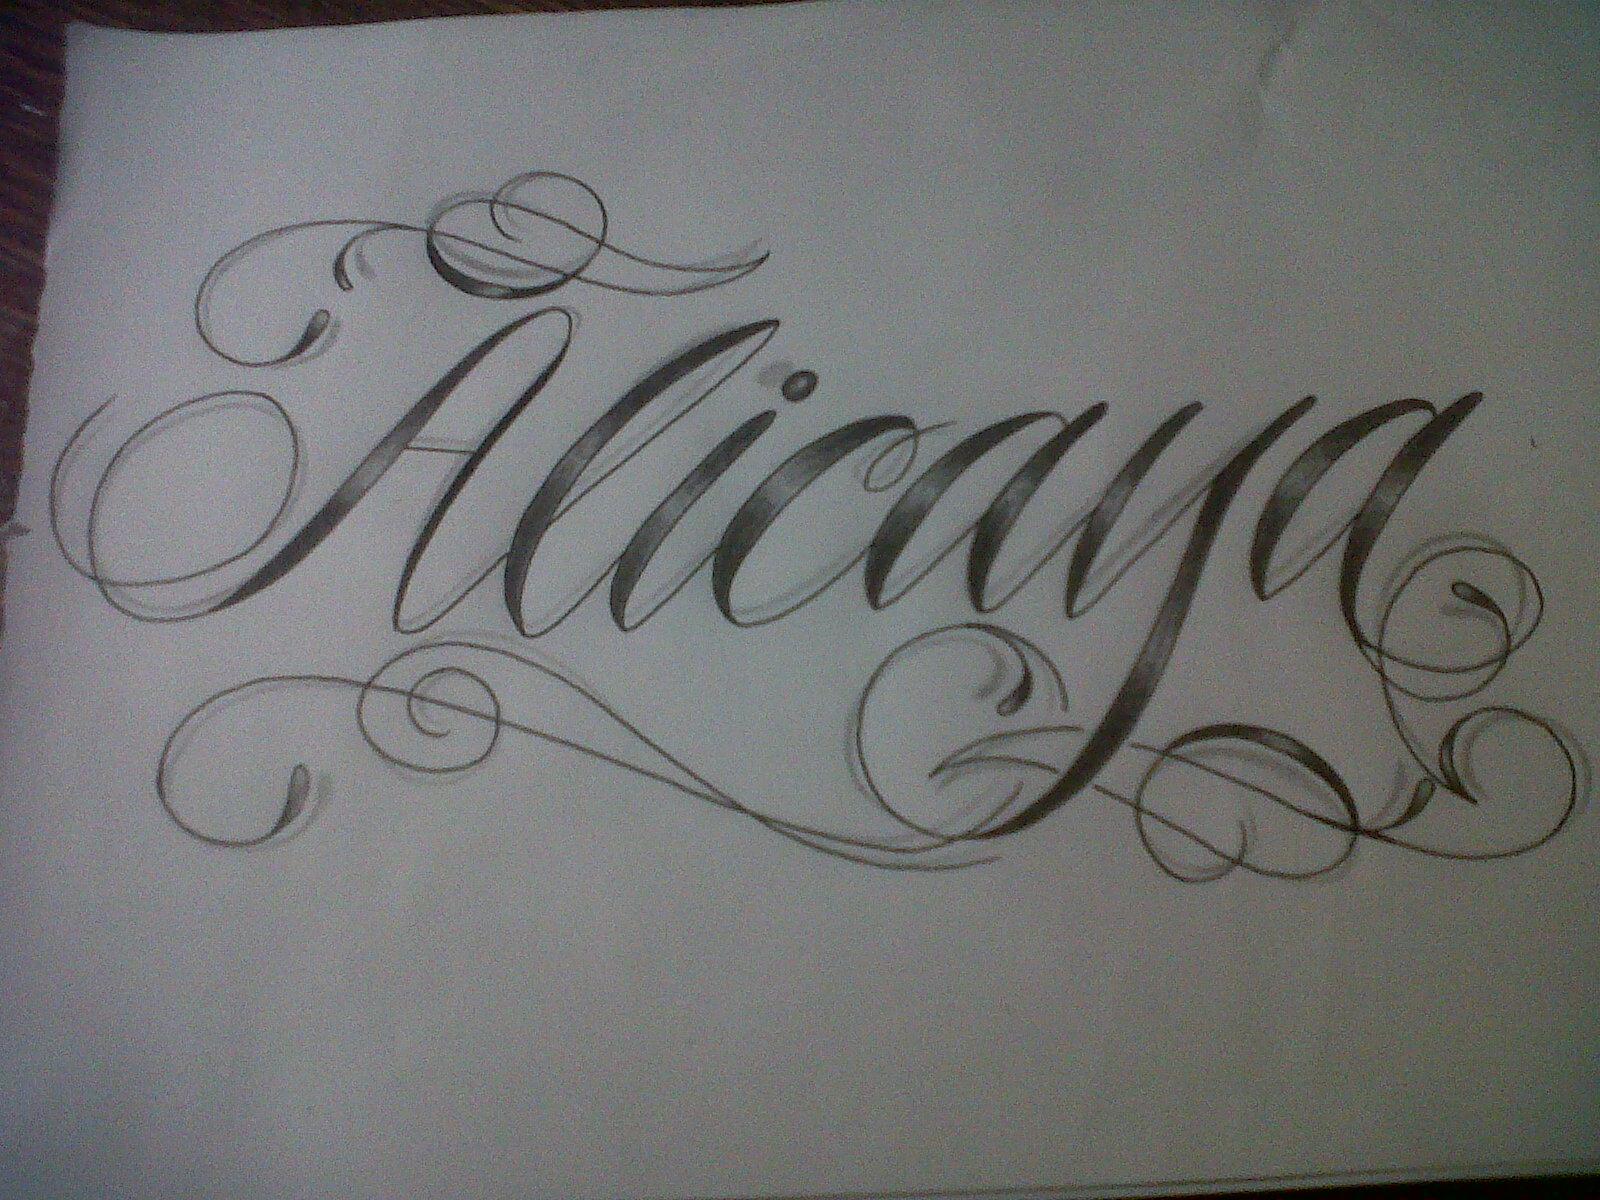 text script font tattoo design by tattoosuzette on DeviantArt